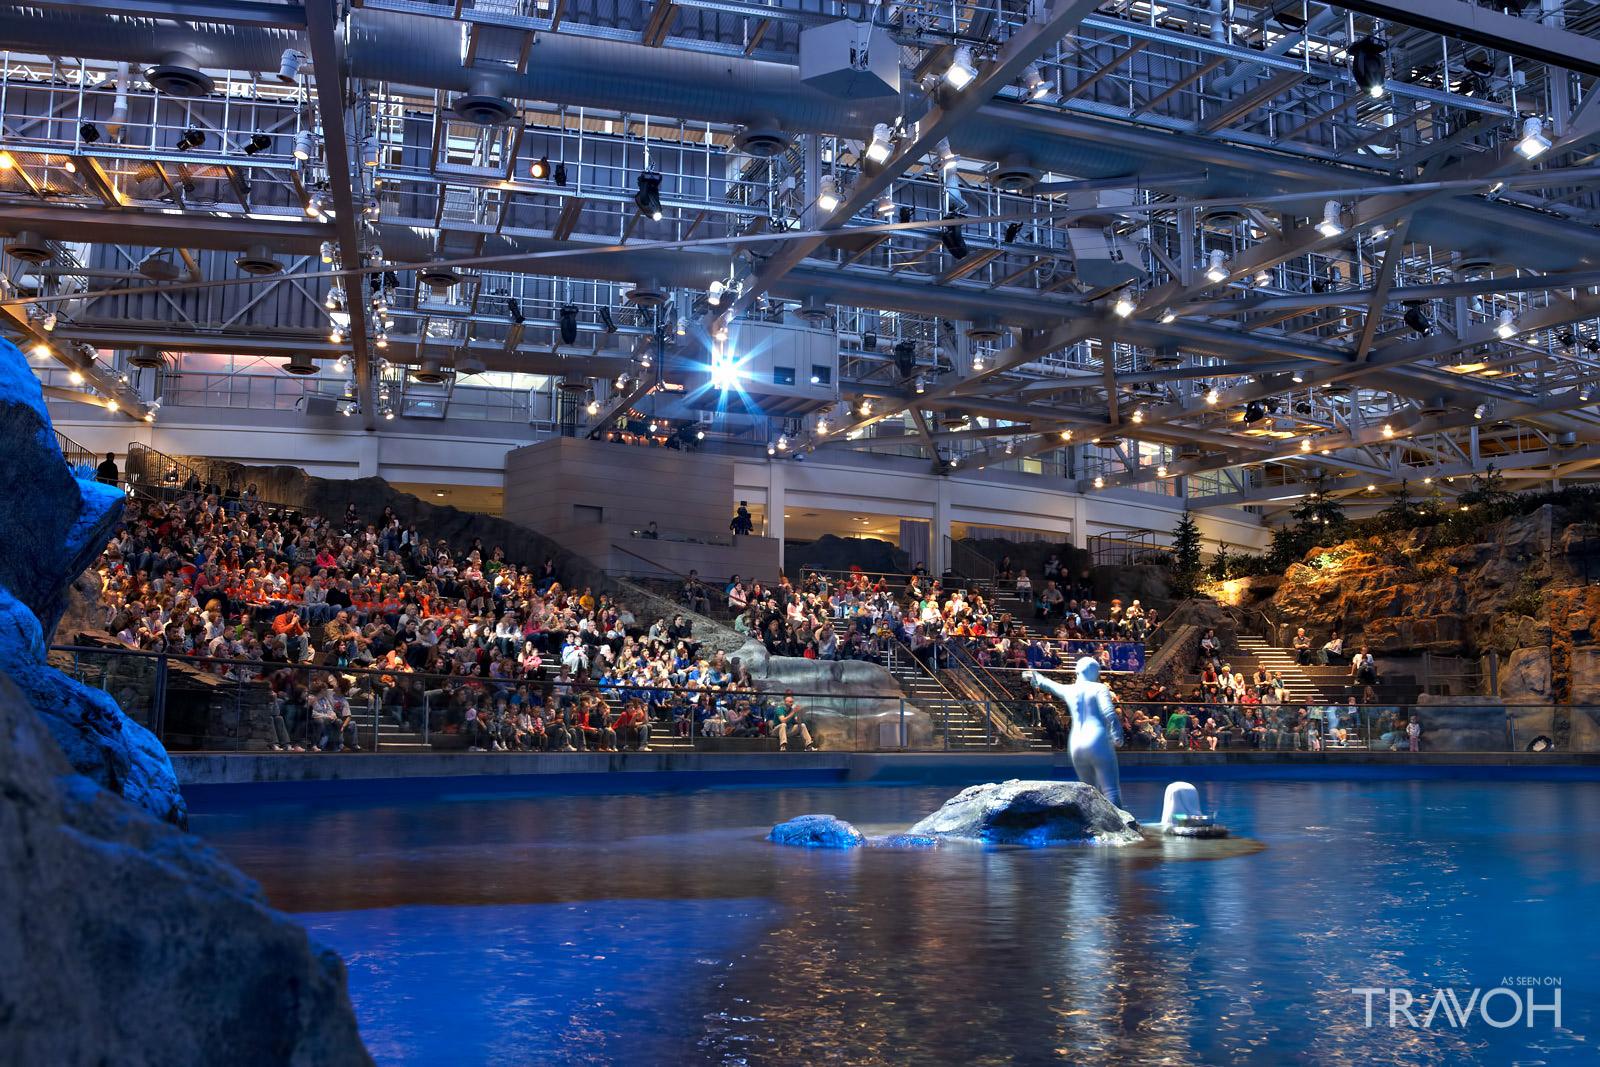 Shedd Aquarium - 1200 S Lake Shore Dr, Chicago, IL 60605